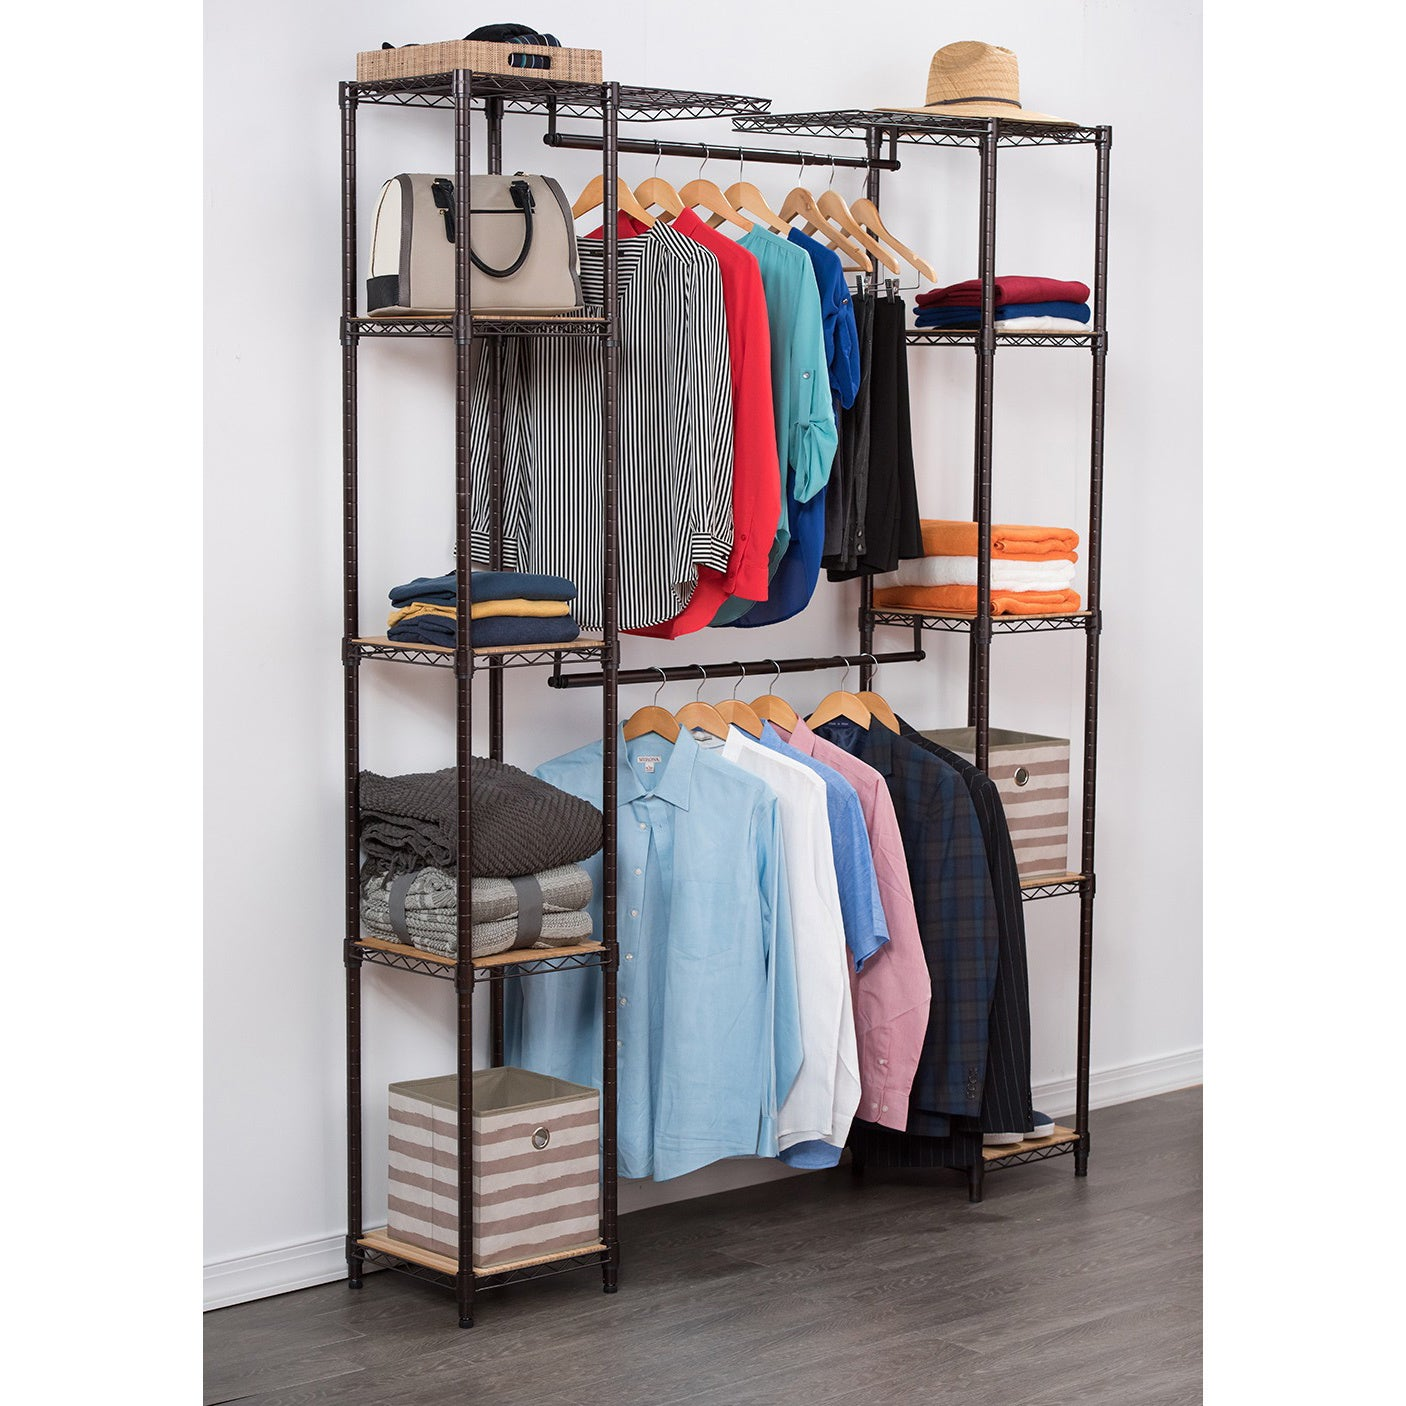 shelf today seville free racking garden home organizer overstock metal baxton by studio shipping product closet rack storage